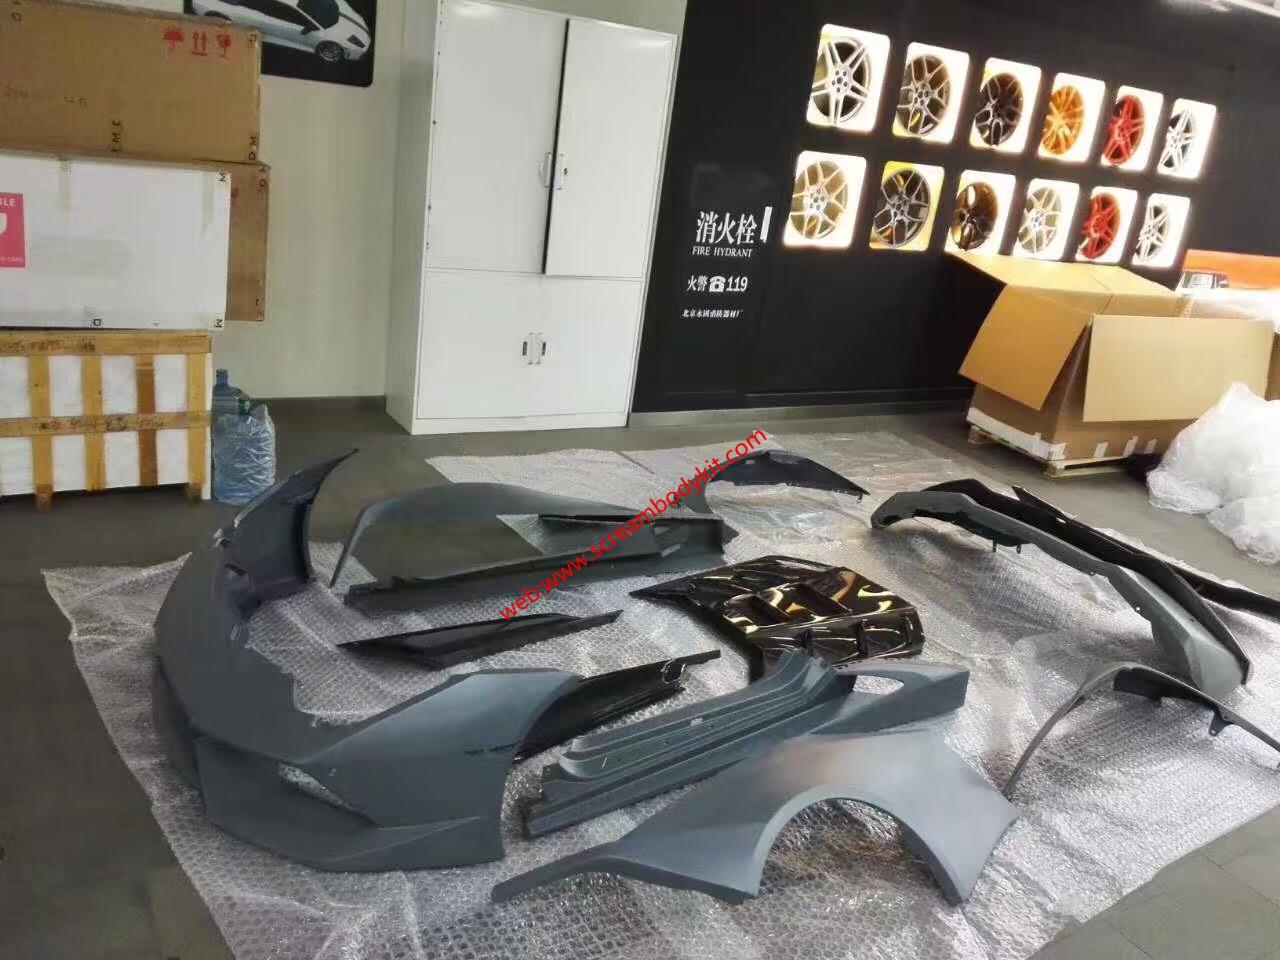 Huracan LP610-4 Update Novitec Wide body kit front bumper after bumper fenders side skirts